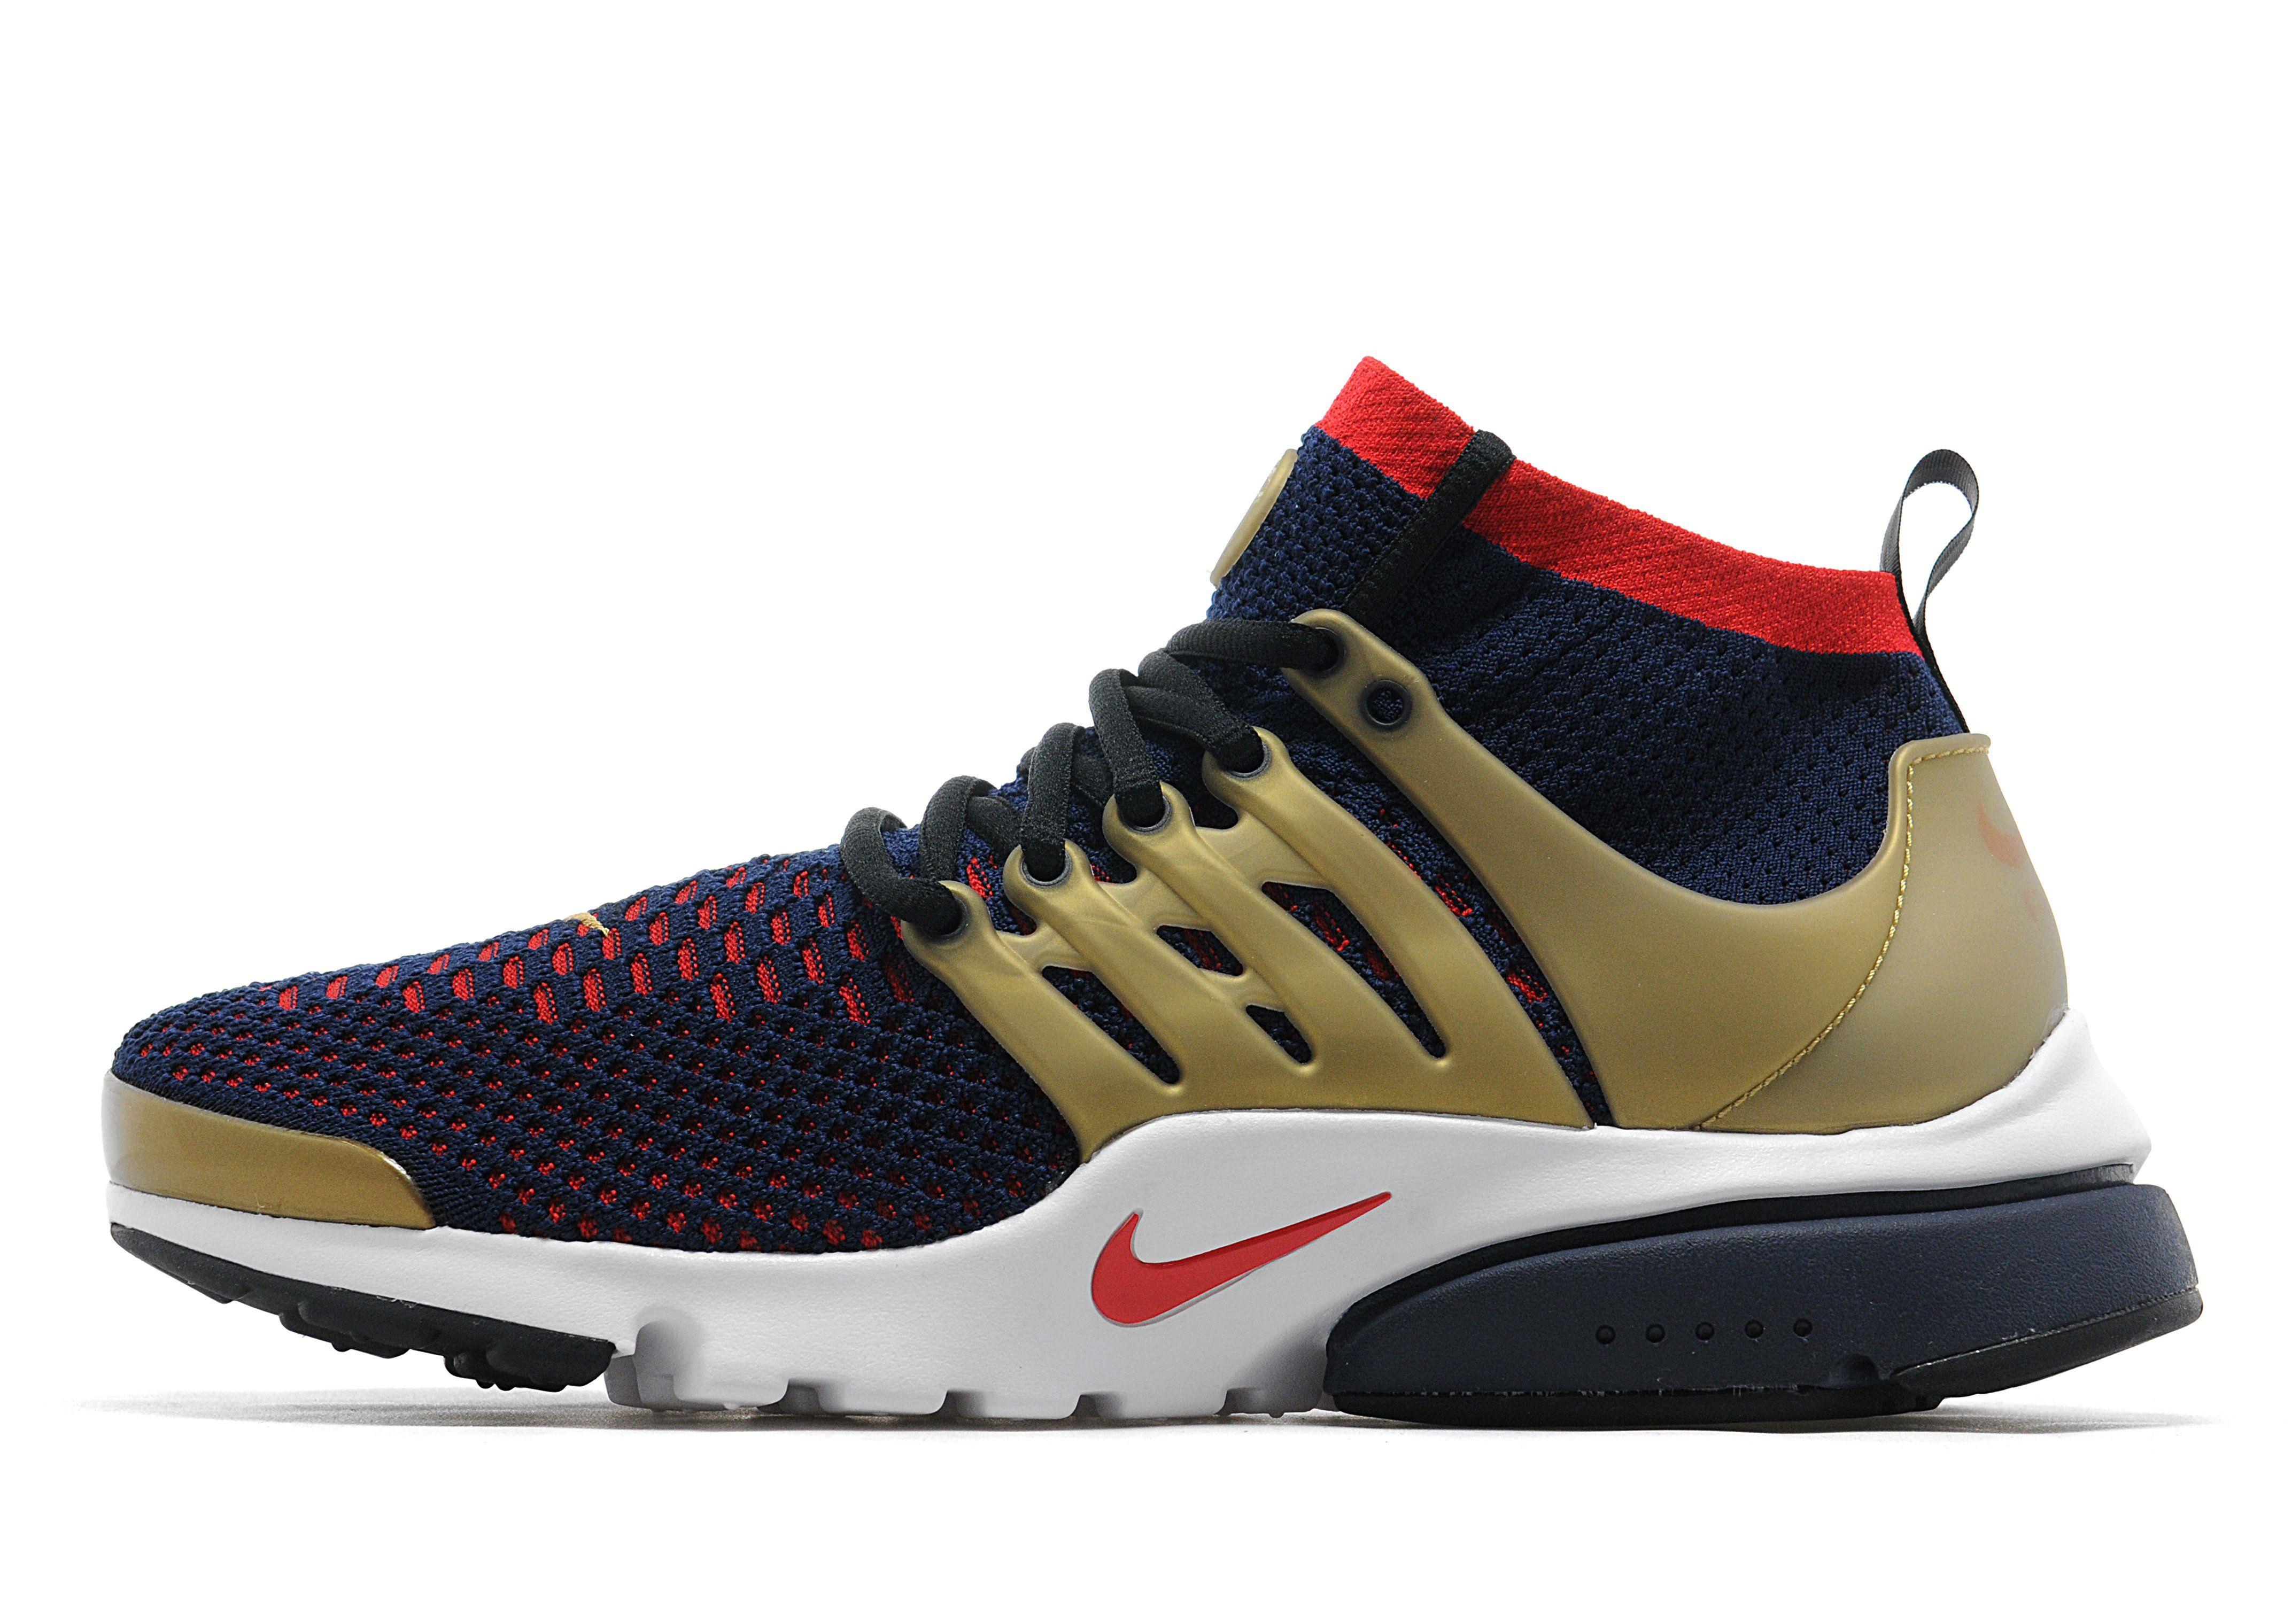 Nike Air Presto Flyknit Ultra 'Olympic' Pack